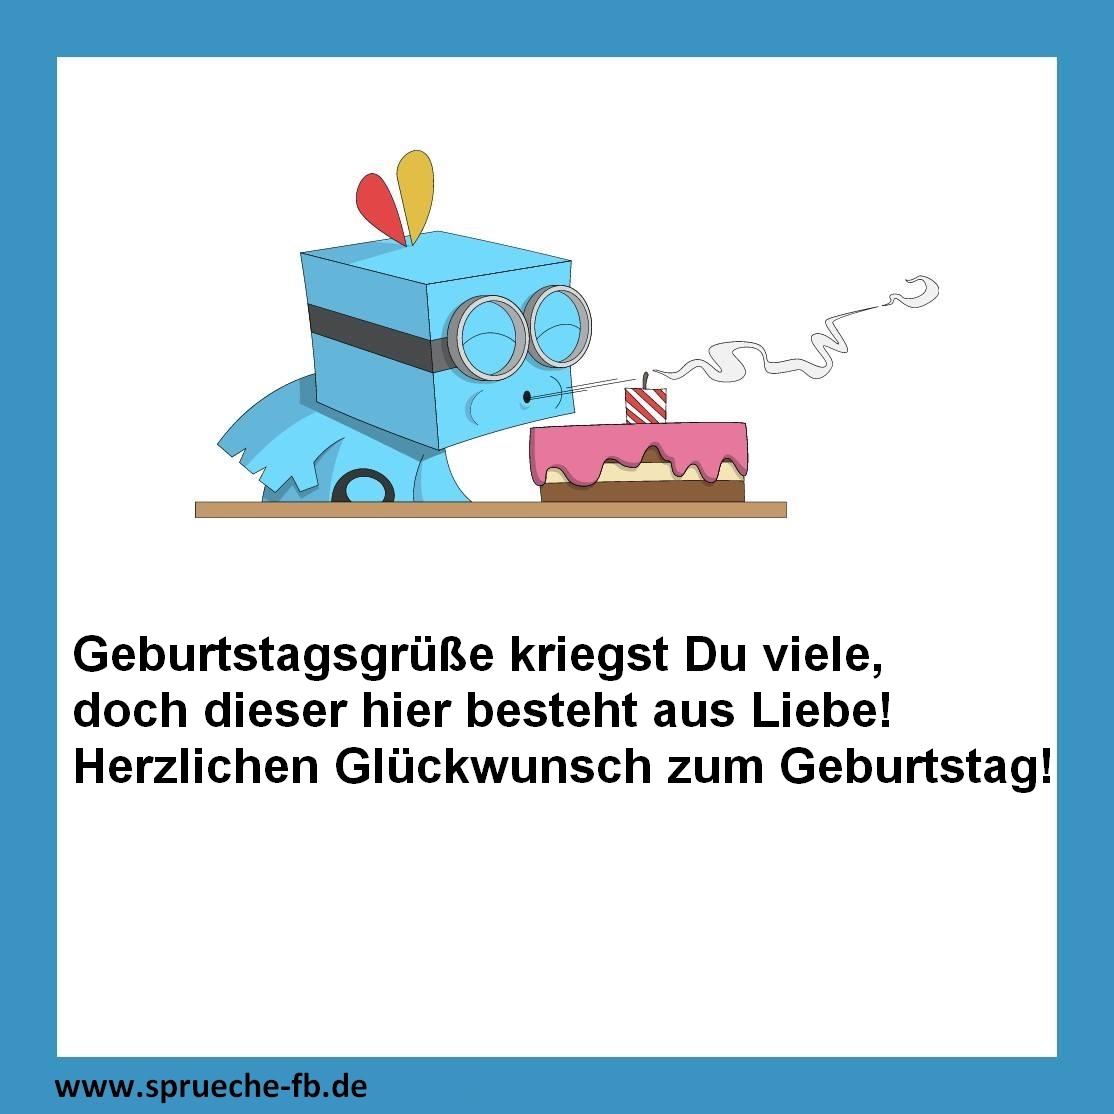 fiese sprche zum geburtstag ~ jan.cukjati design